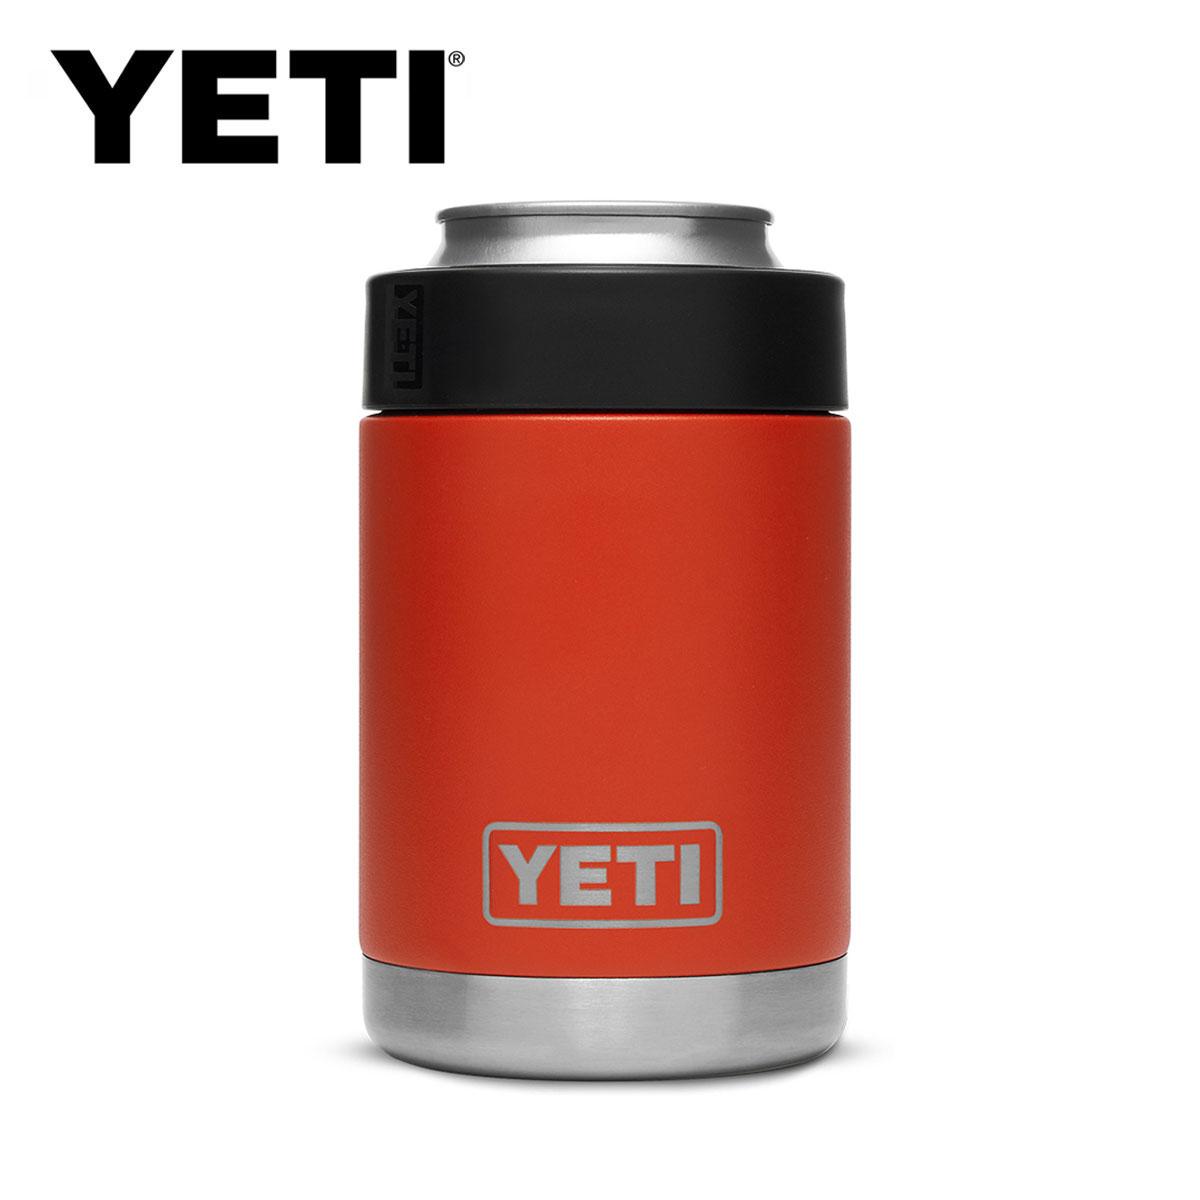 6f682653a51 Yeti YETI regular article drink holder Rambler YETI RAMBLER COLSTER DRINK  HOLDER 12 oz CANYON RED ...